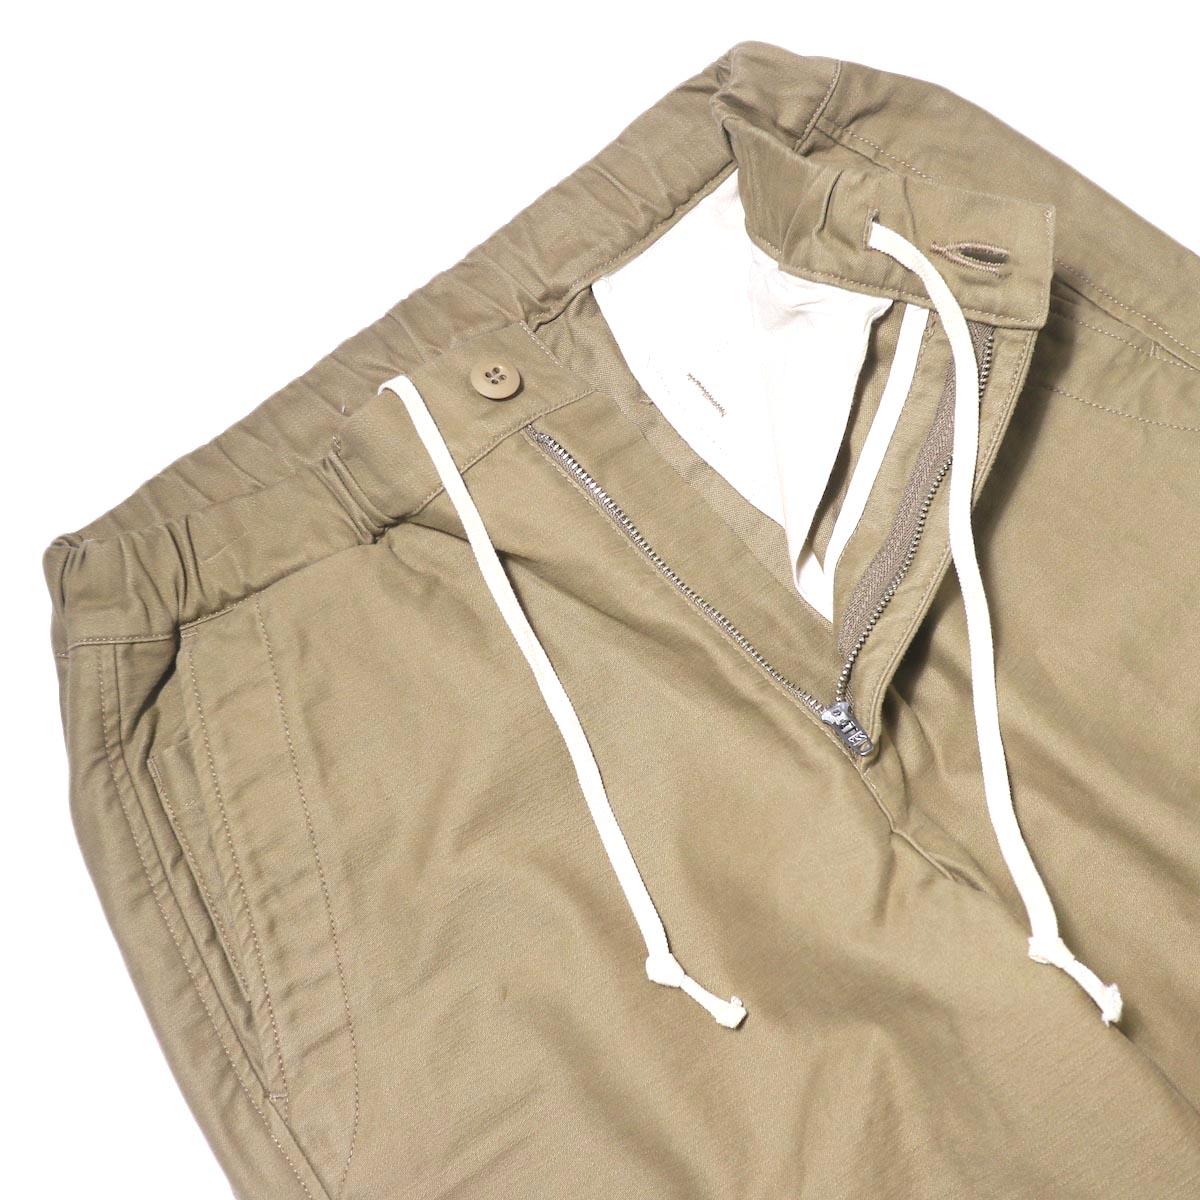 BRENA / Coq Pants (beige) ウエスト・ドローコード